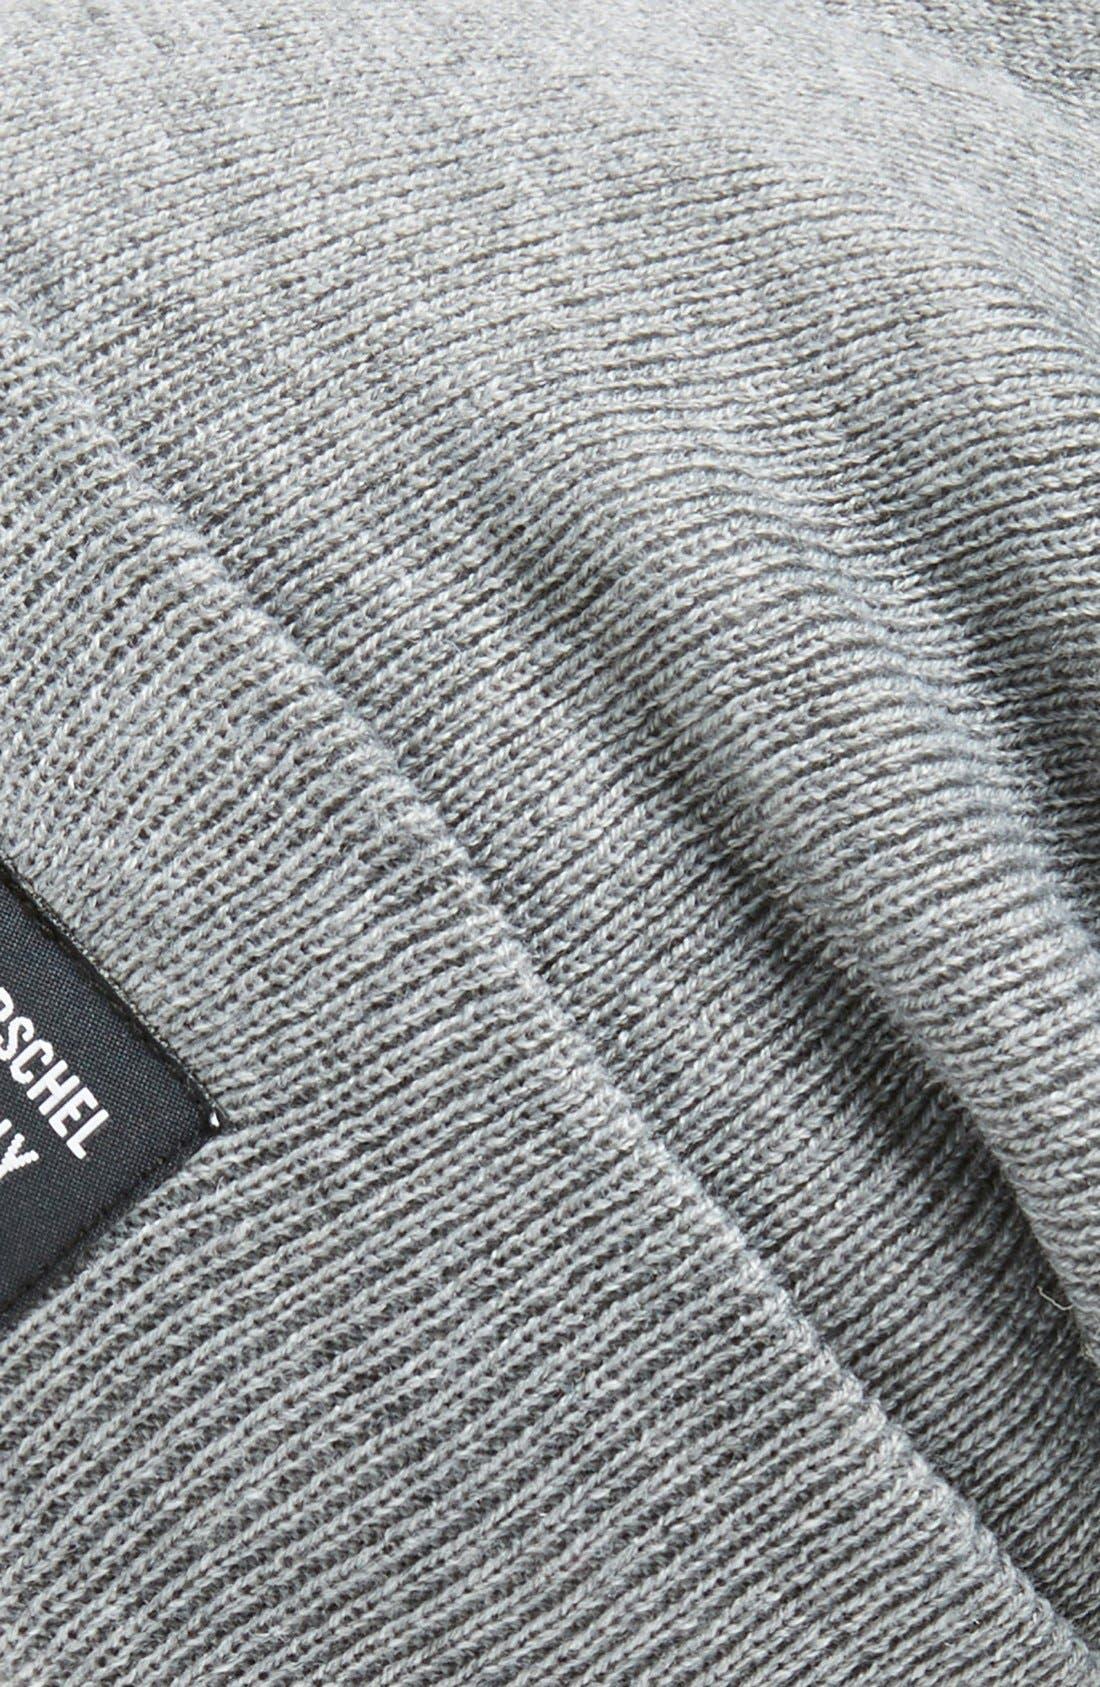 'Abbott' Knit Cap,                             Alternate thumbnail 9, color,